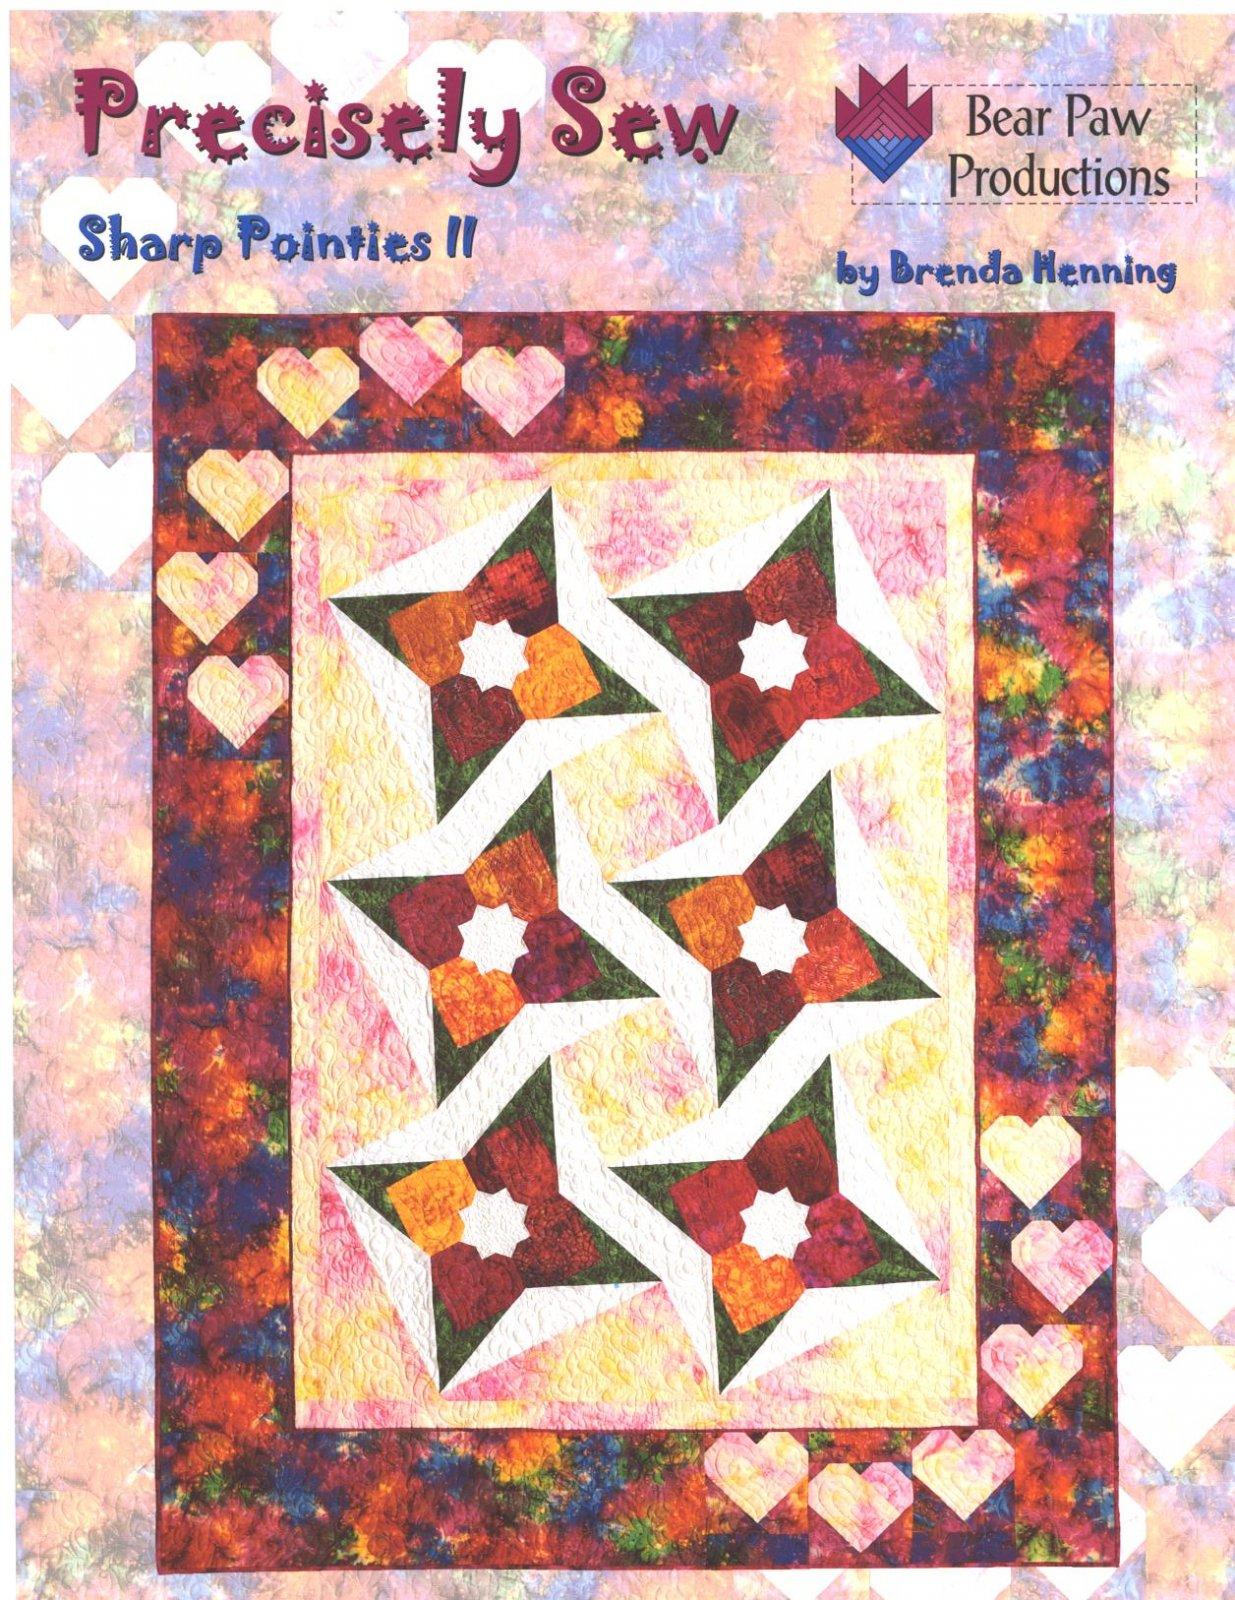 Precisely Sew ~ Sharp Pointies II